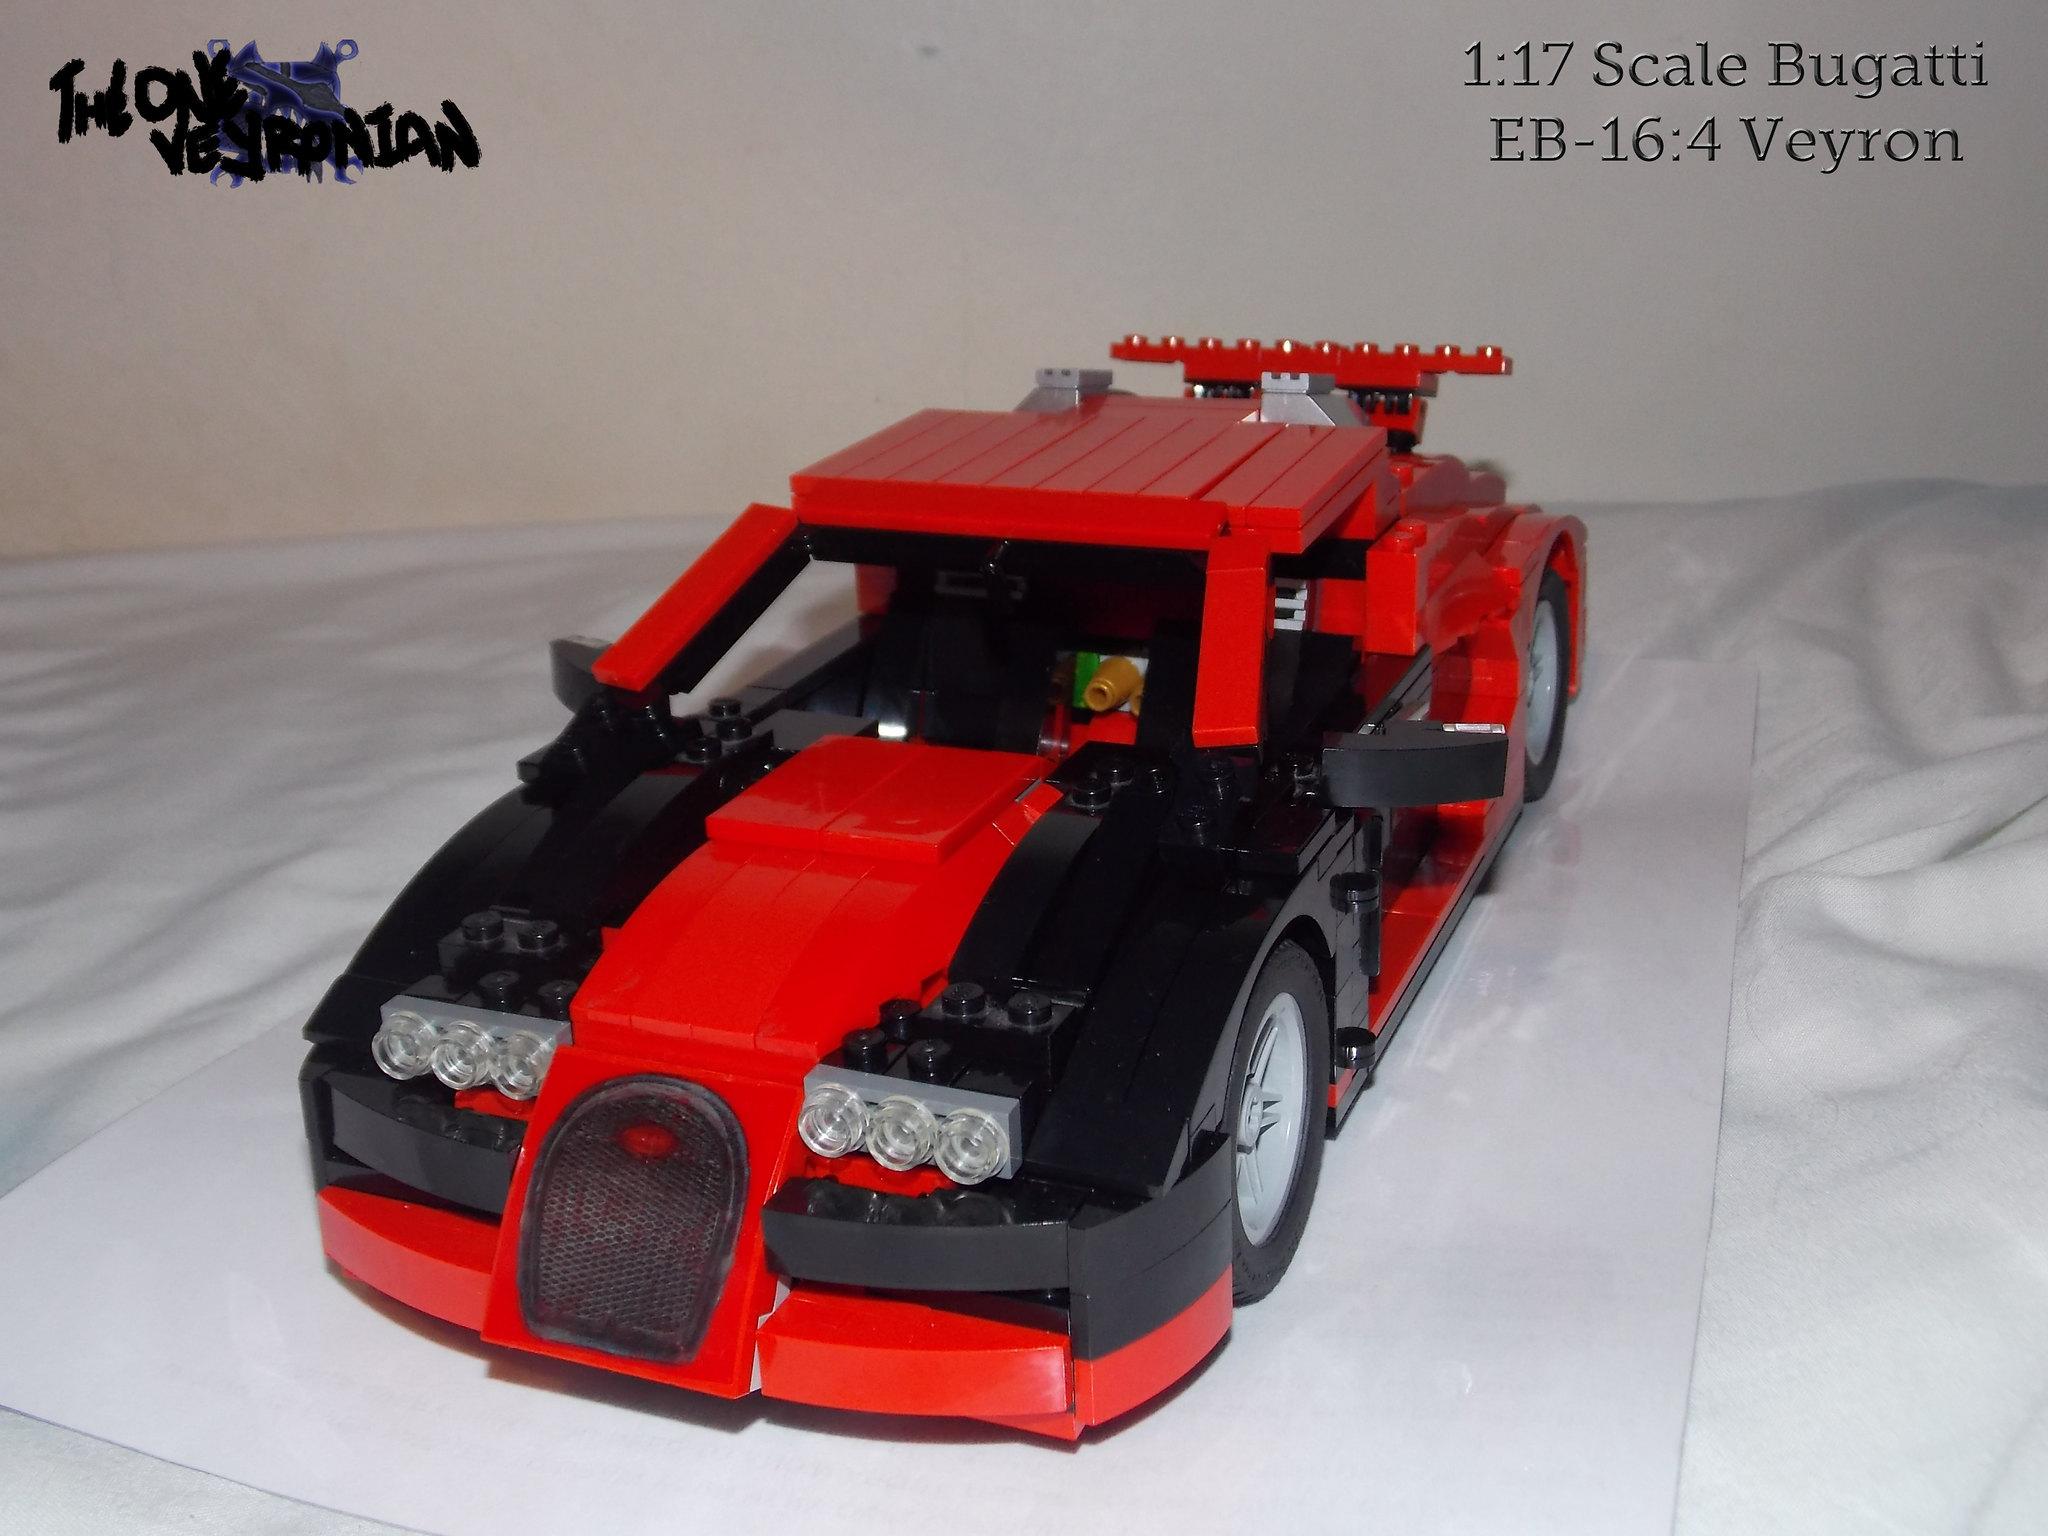 lego moc bugatti veyron 14 studs wide 1 i completely f flickr photo sharing. Black Bedroom Furniture Sets. Home Design Ideas